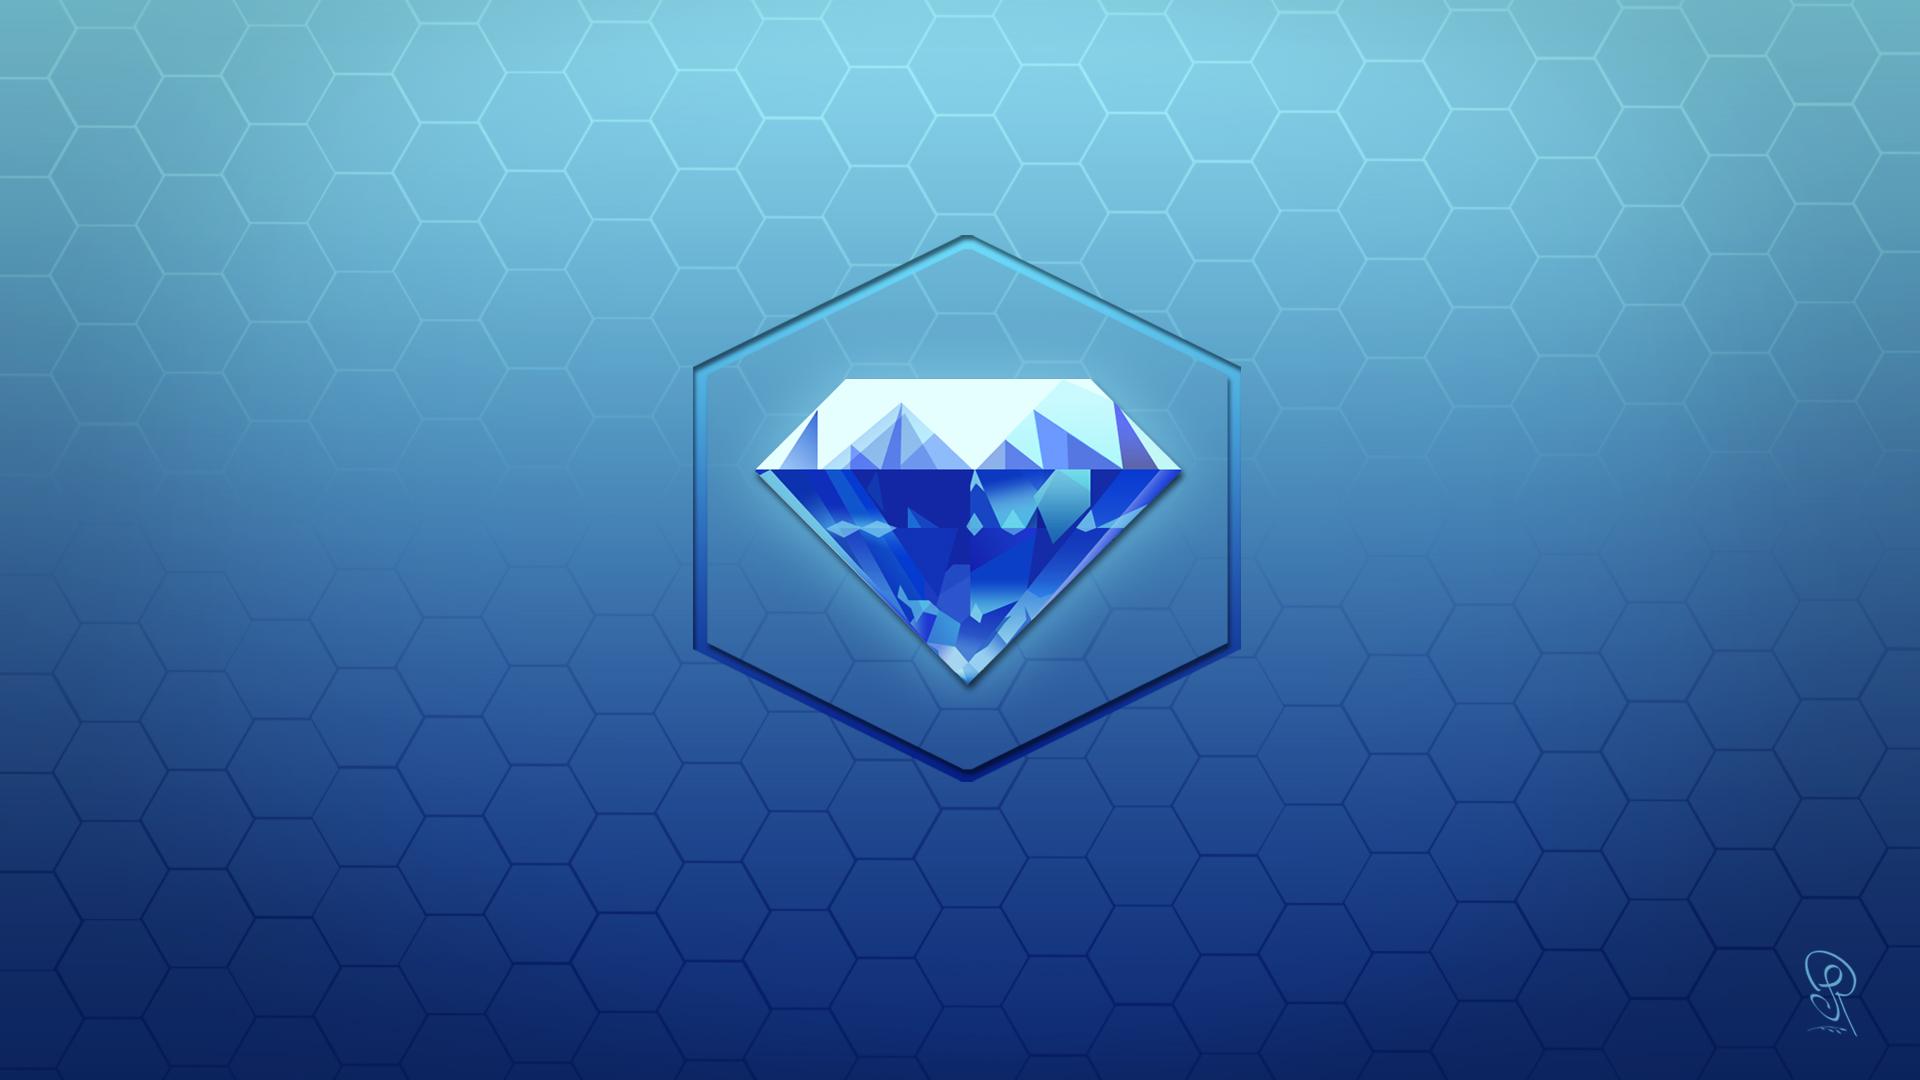 Anime Hd Wallpapers 1080p Free Diamond Backgrounds Pixelstalk Net